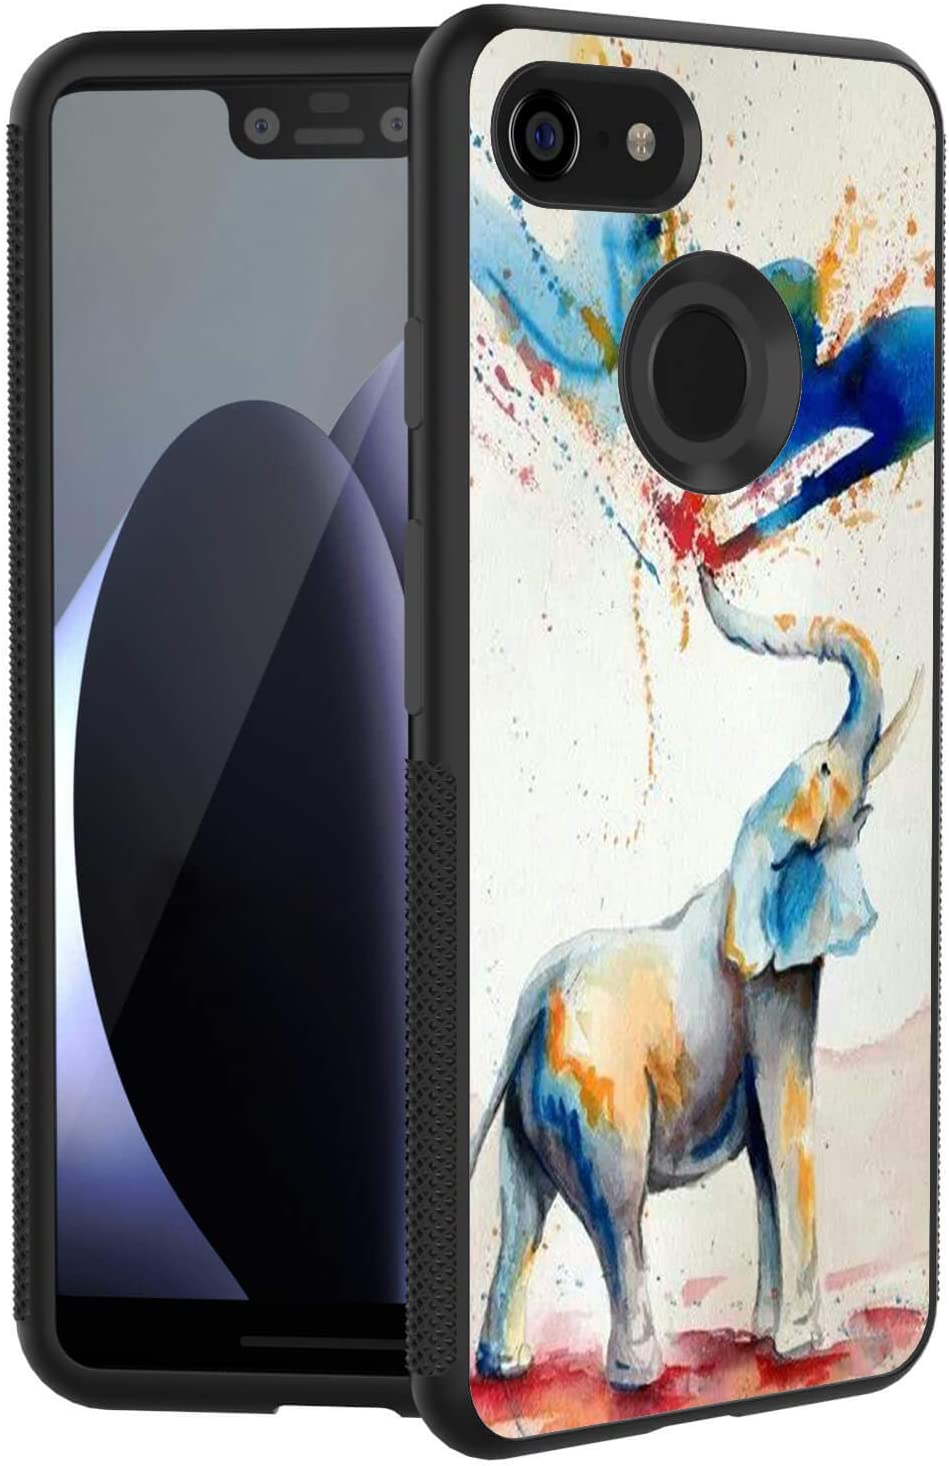 POKABOO Google Pixel 3 XL Case, [Scratch Resistance + Shock Absorption] Slim Flexible Protective Silicone Cover Phone Case for Google Pixel 3 XL - Colorful Elephant